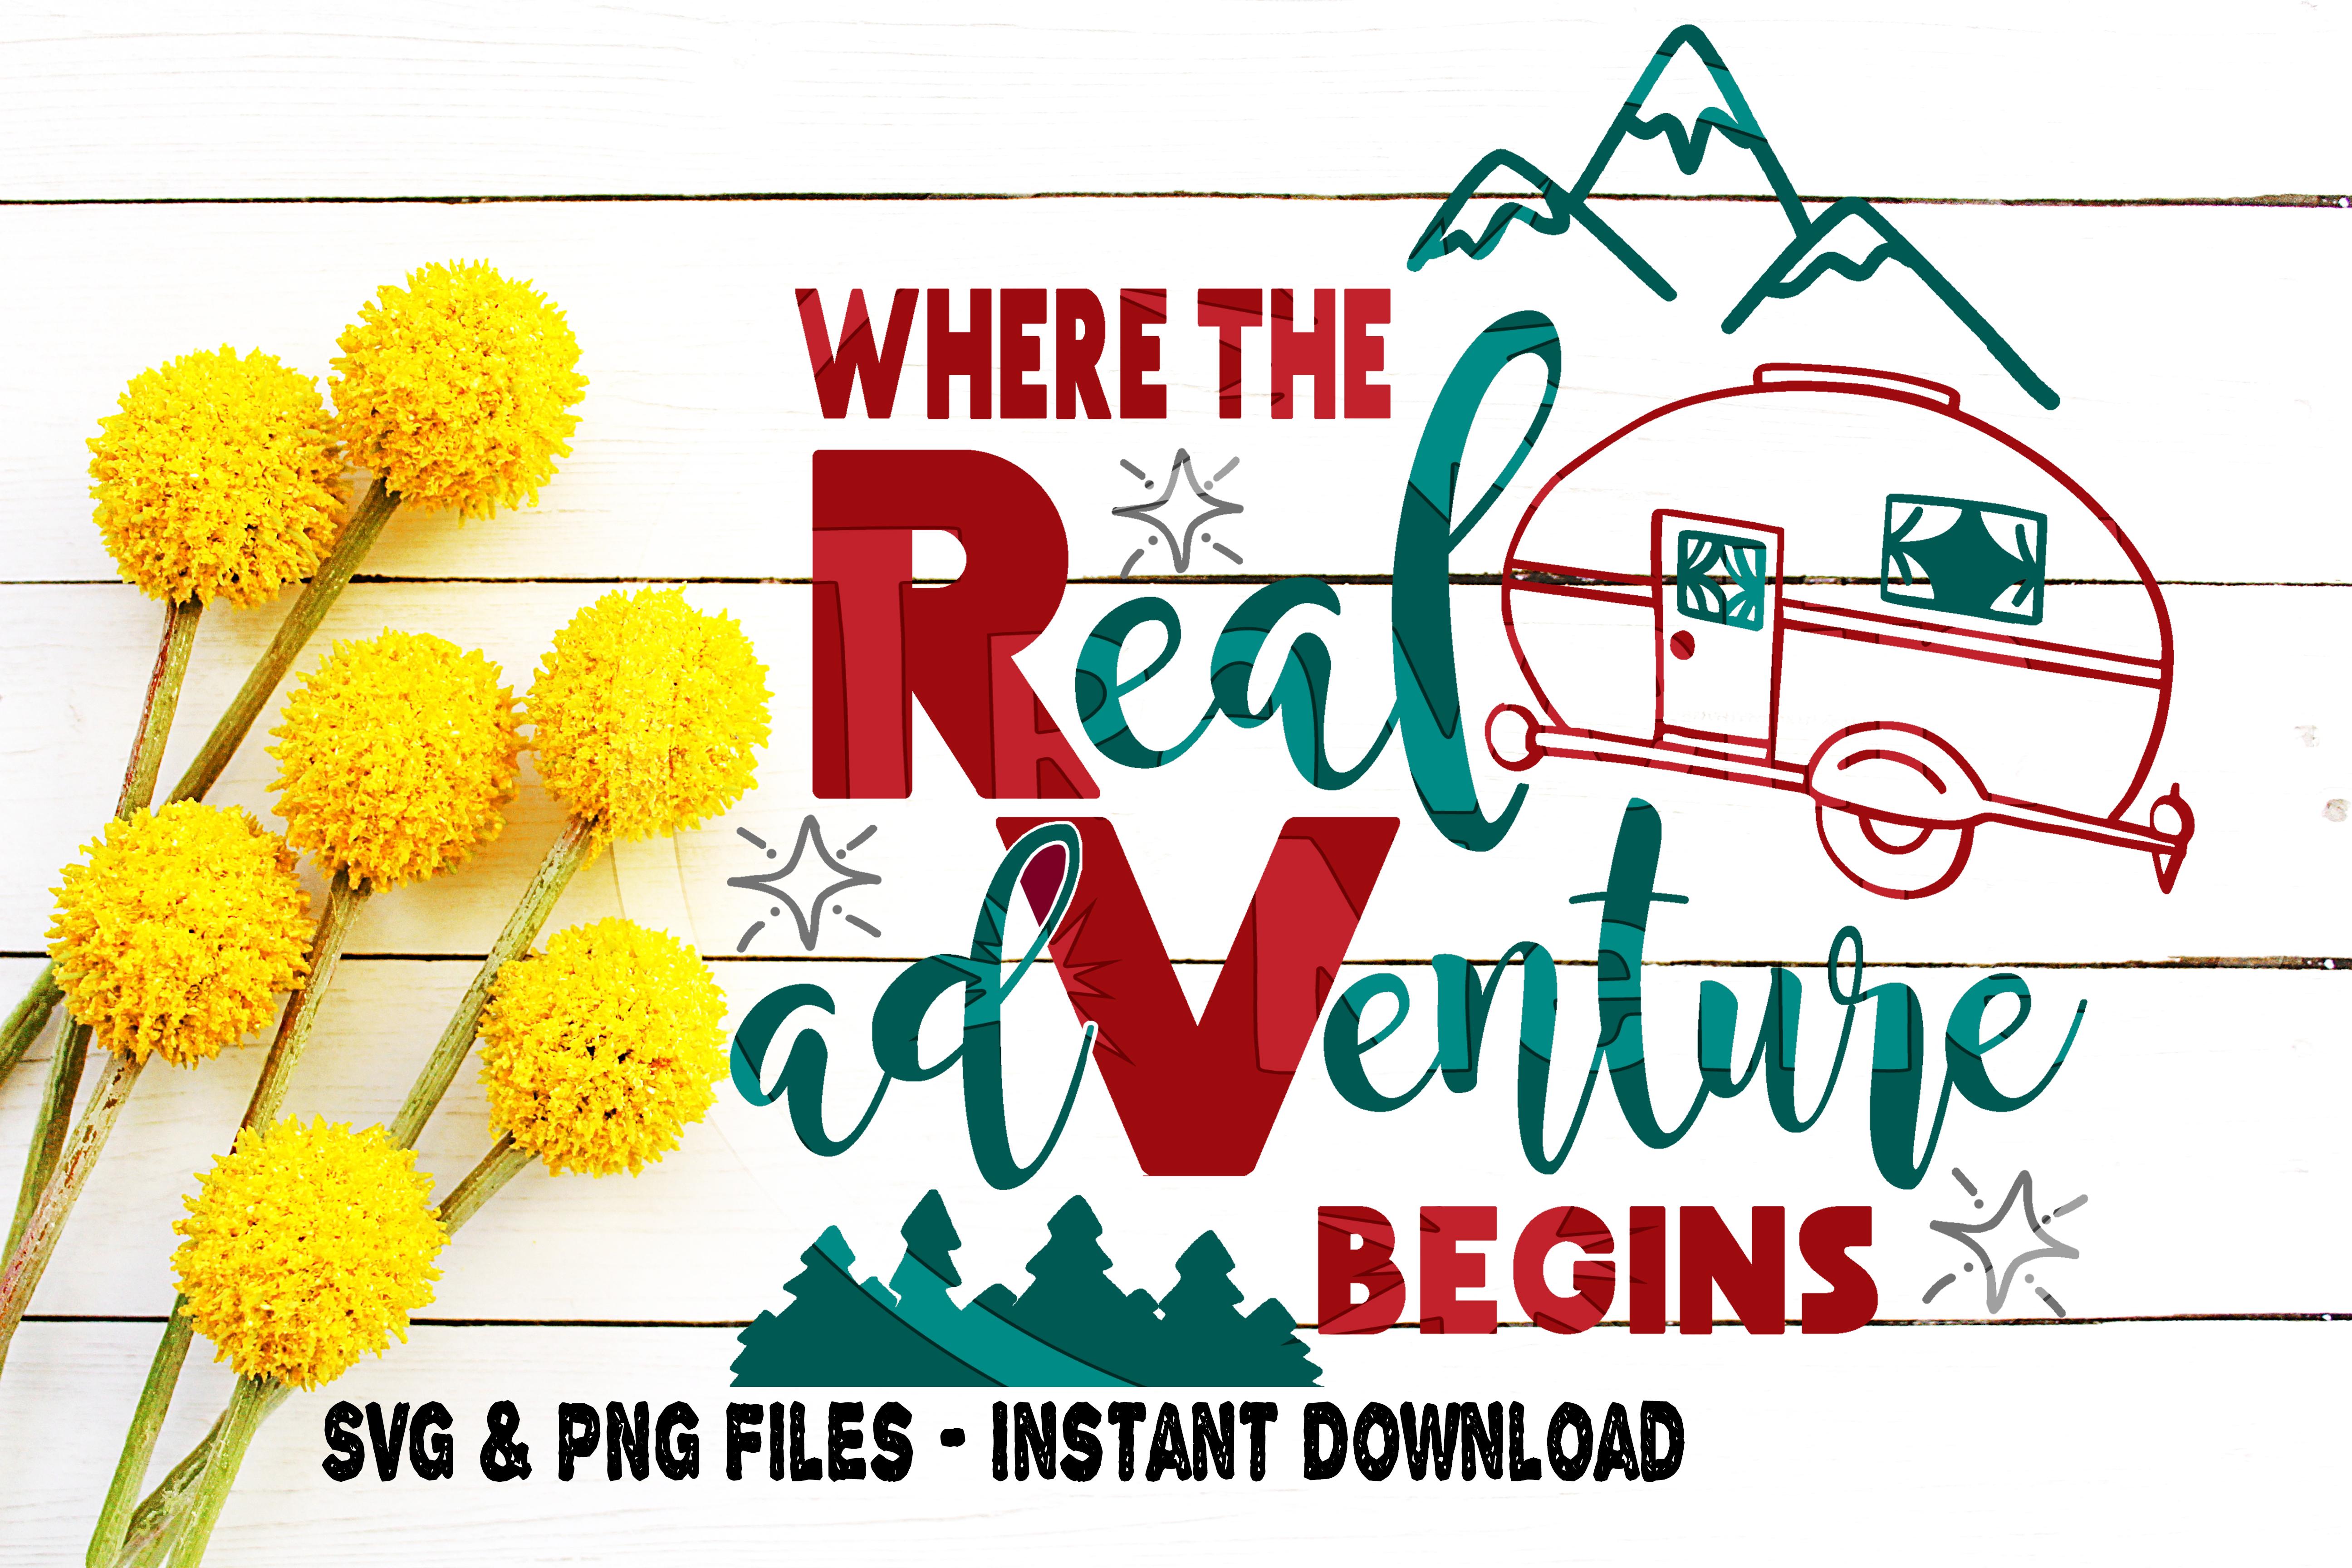 RV Svg, Where The Adventure Begins svg, Travel svg, Explore svg, RV Life svg, Camp svg,  Vintage, Retro, Cut file for, Cricut, Silhouette example image 1